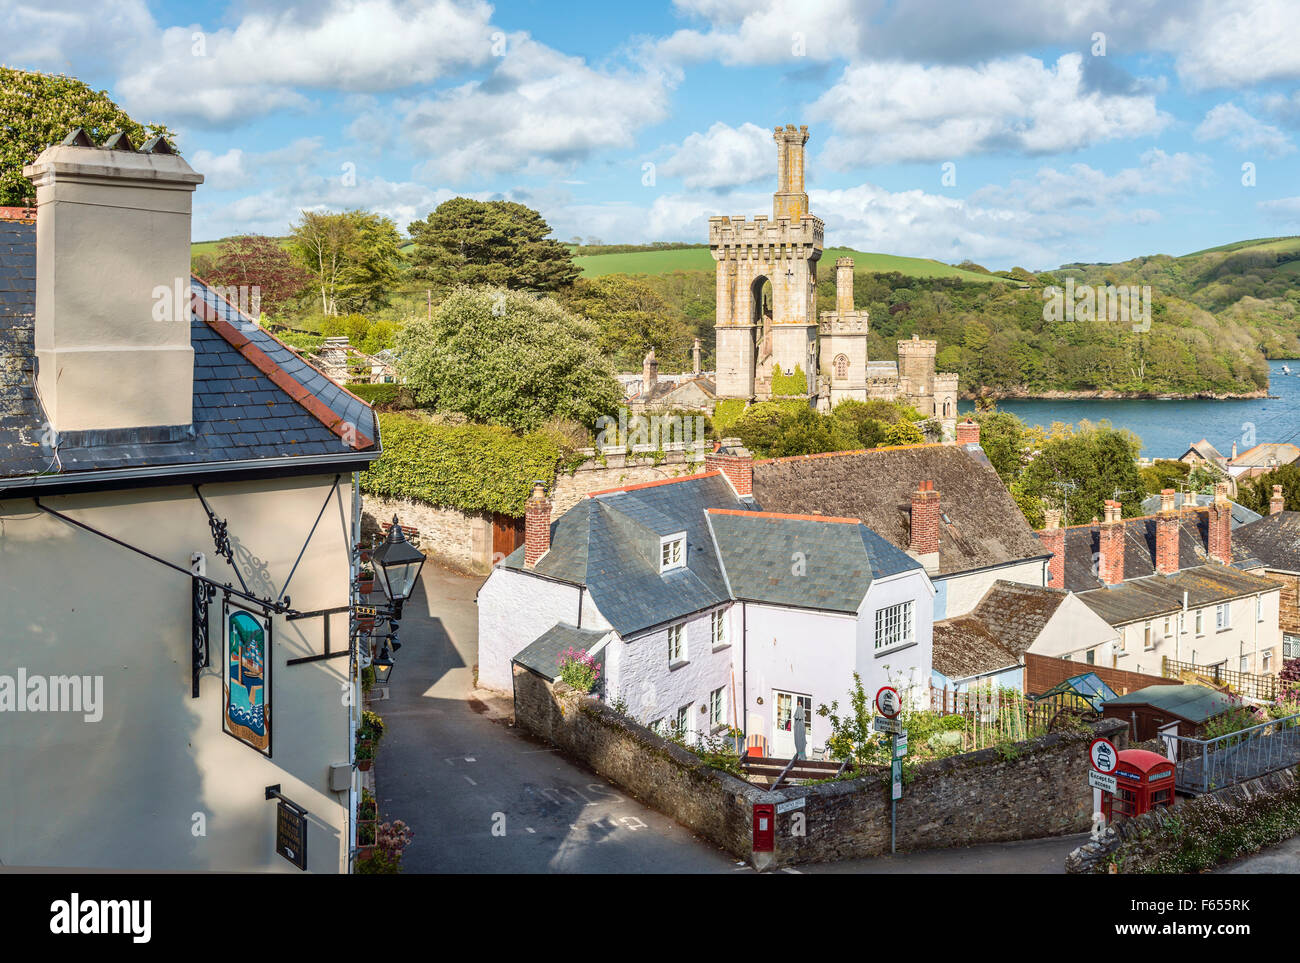 Vista panorámica sobre el casco antiguo de Fowey, Cornwall, Inglaterra, Reino Unido | Malerische Aussicht ueber Imagen De Stock